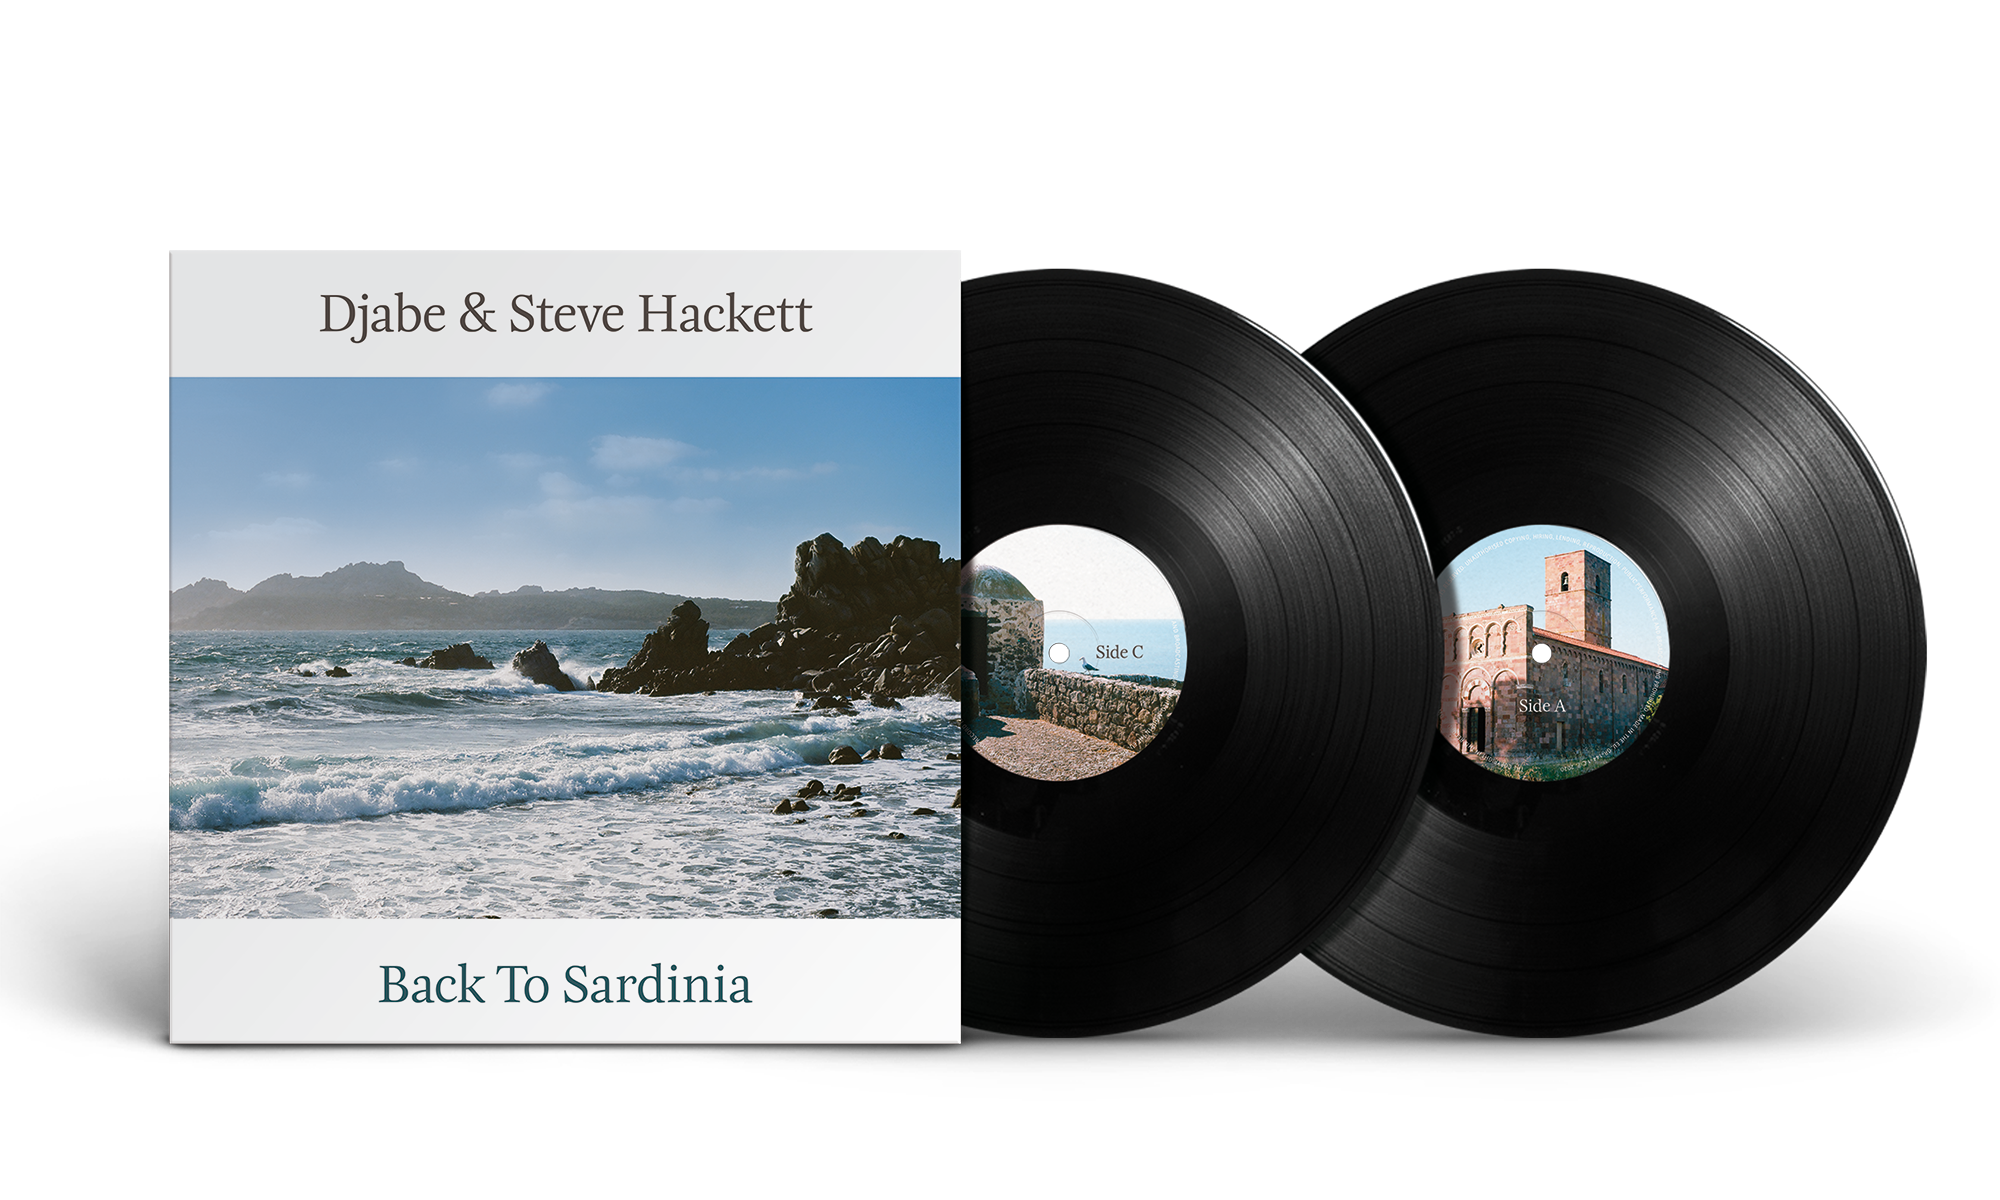 Djabe & Steve Hackett: Back To Sardinia - 2LP